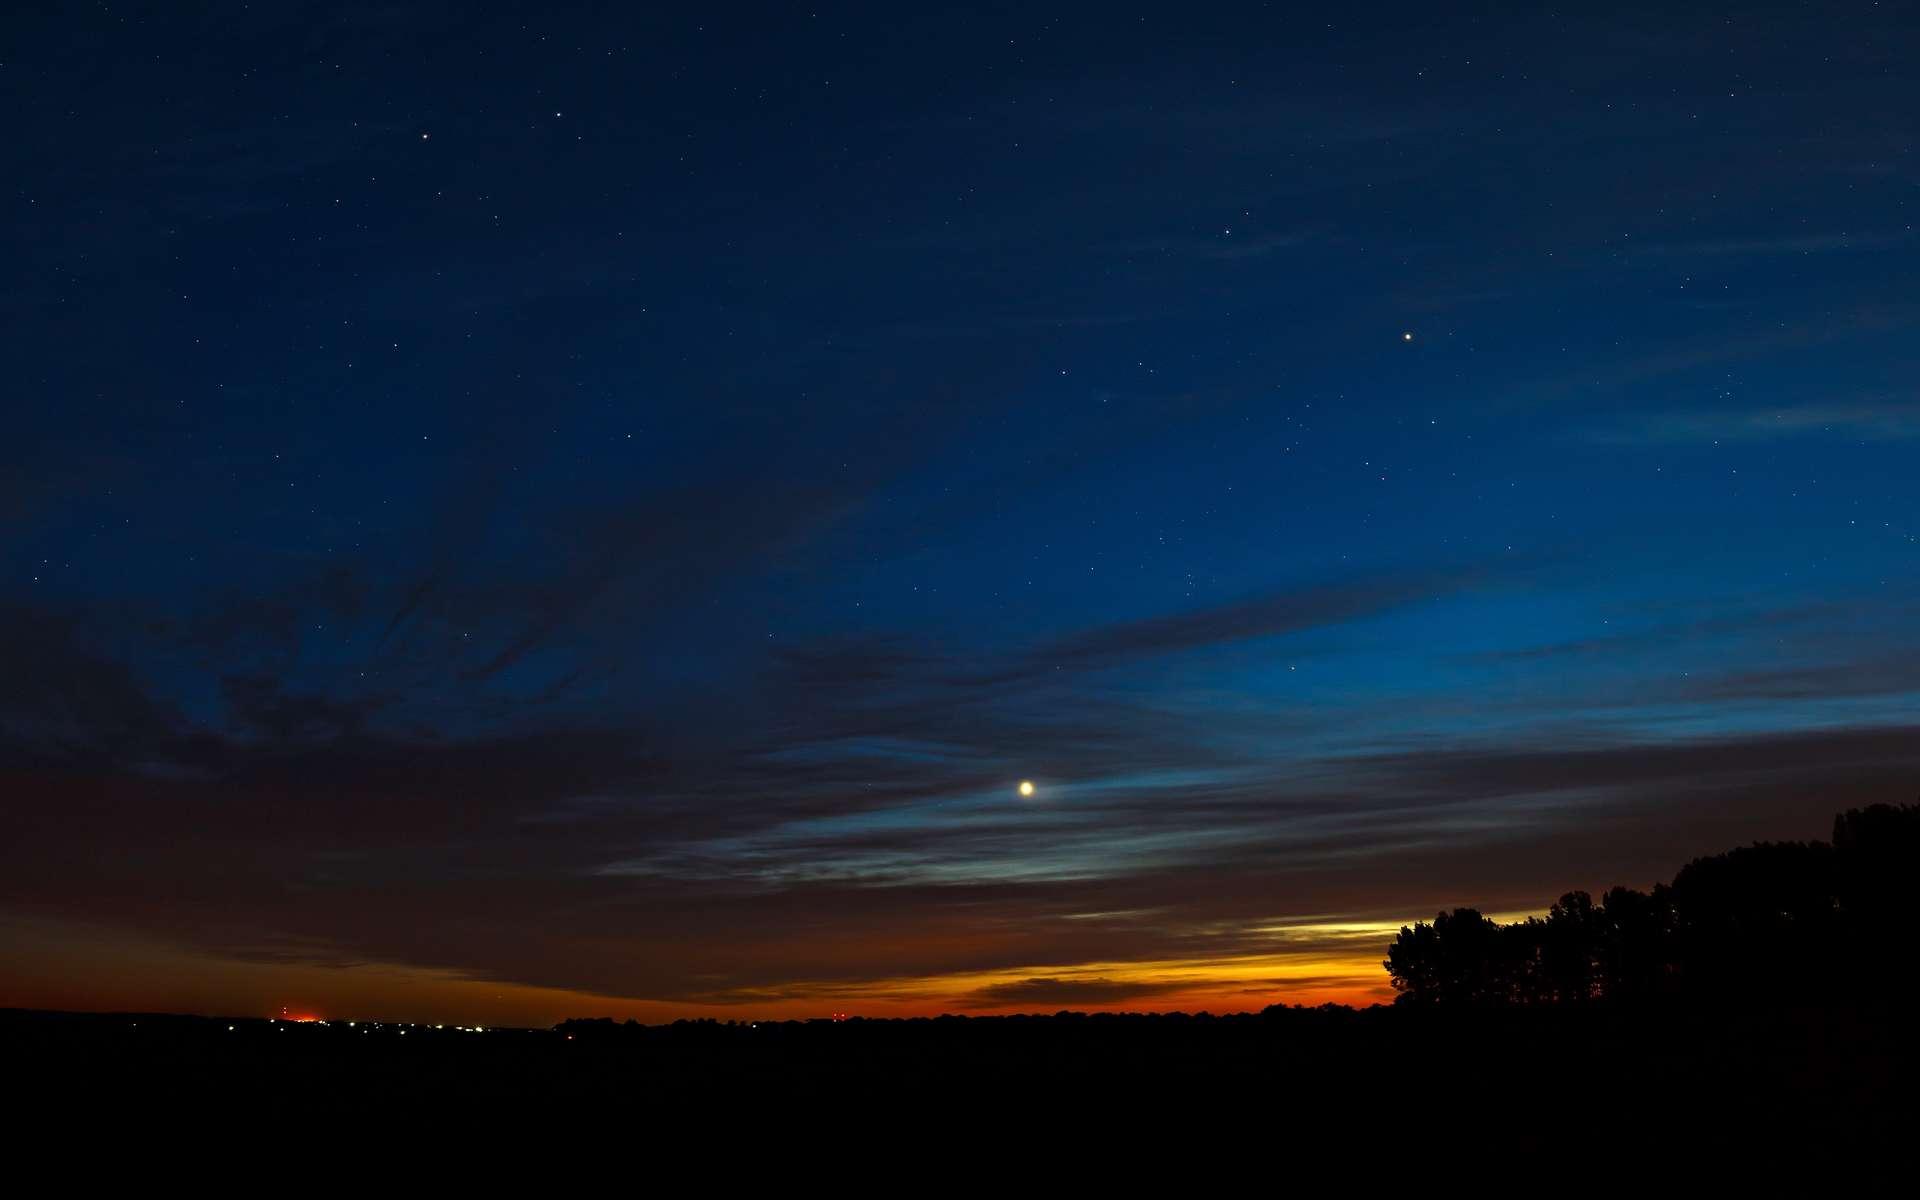 Vénus au crépuscule. © olgapkurguzova, Adobe Stock